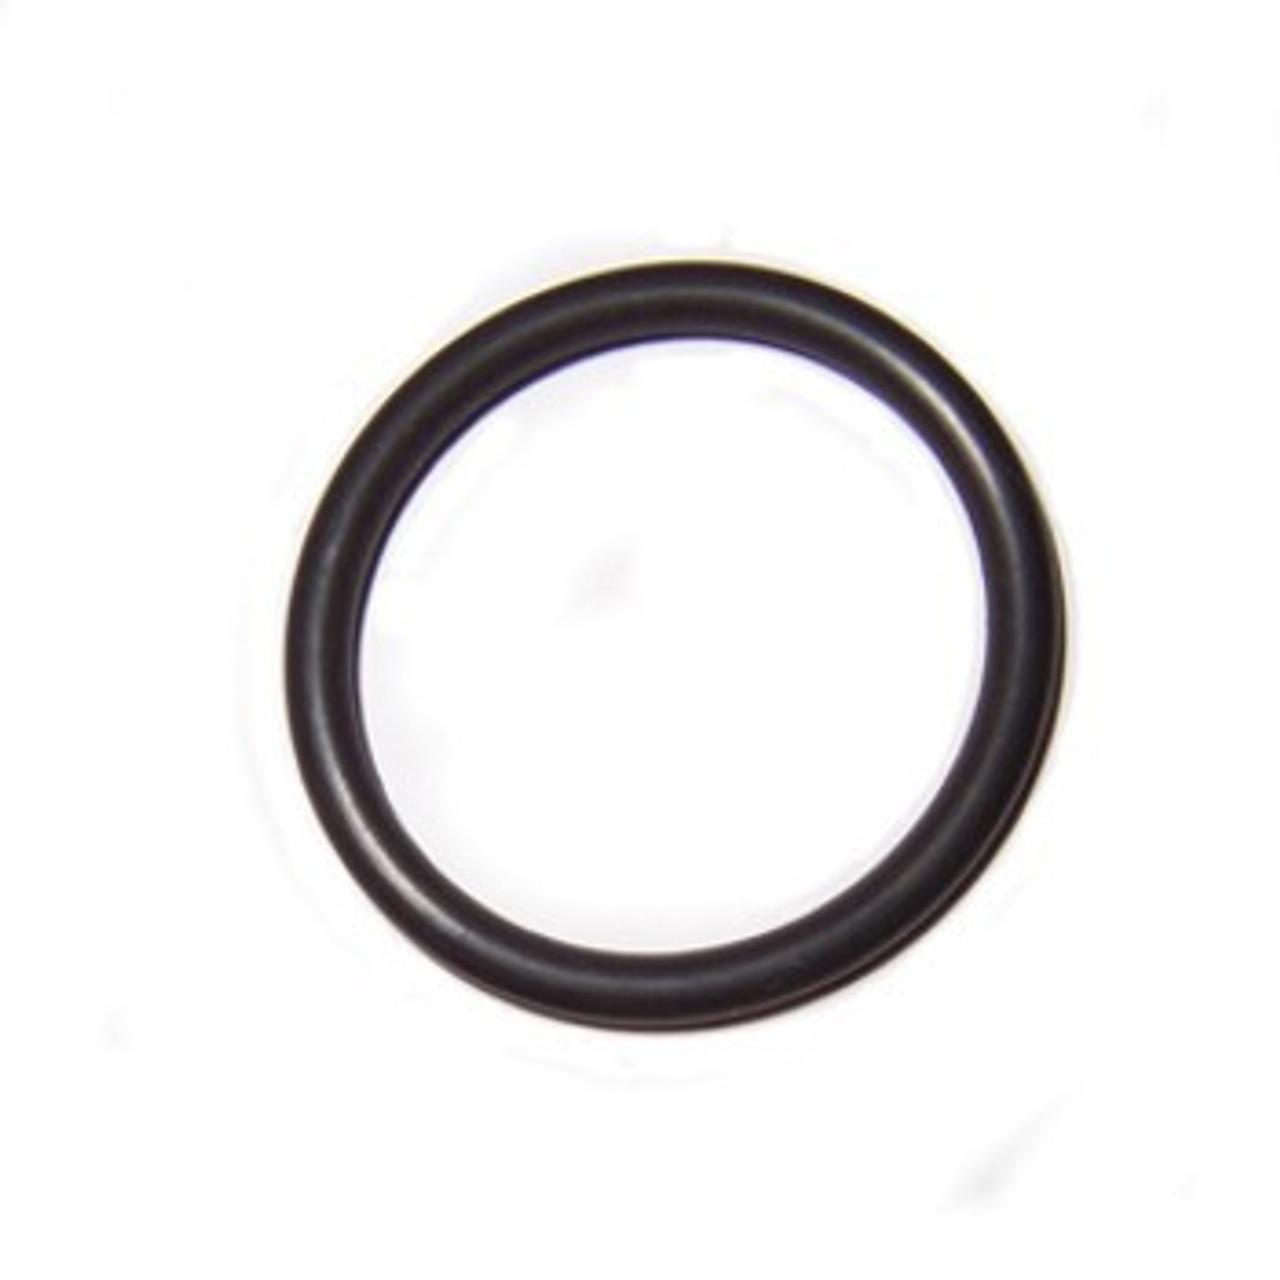 oil fill riser to valve cover o ring 94 07 [ 1280 x 1280 Pixel ]